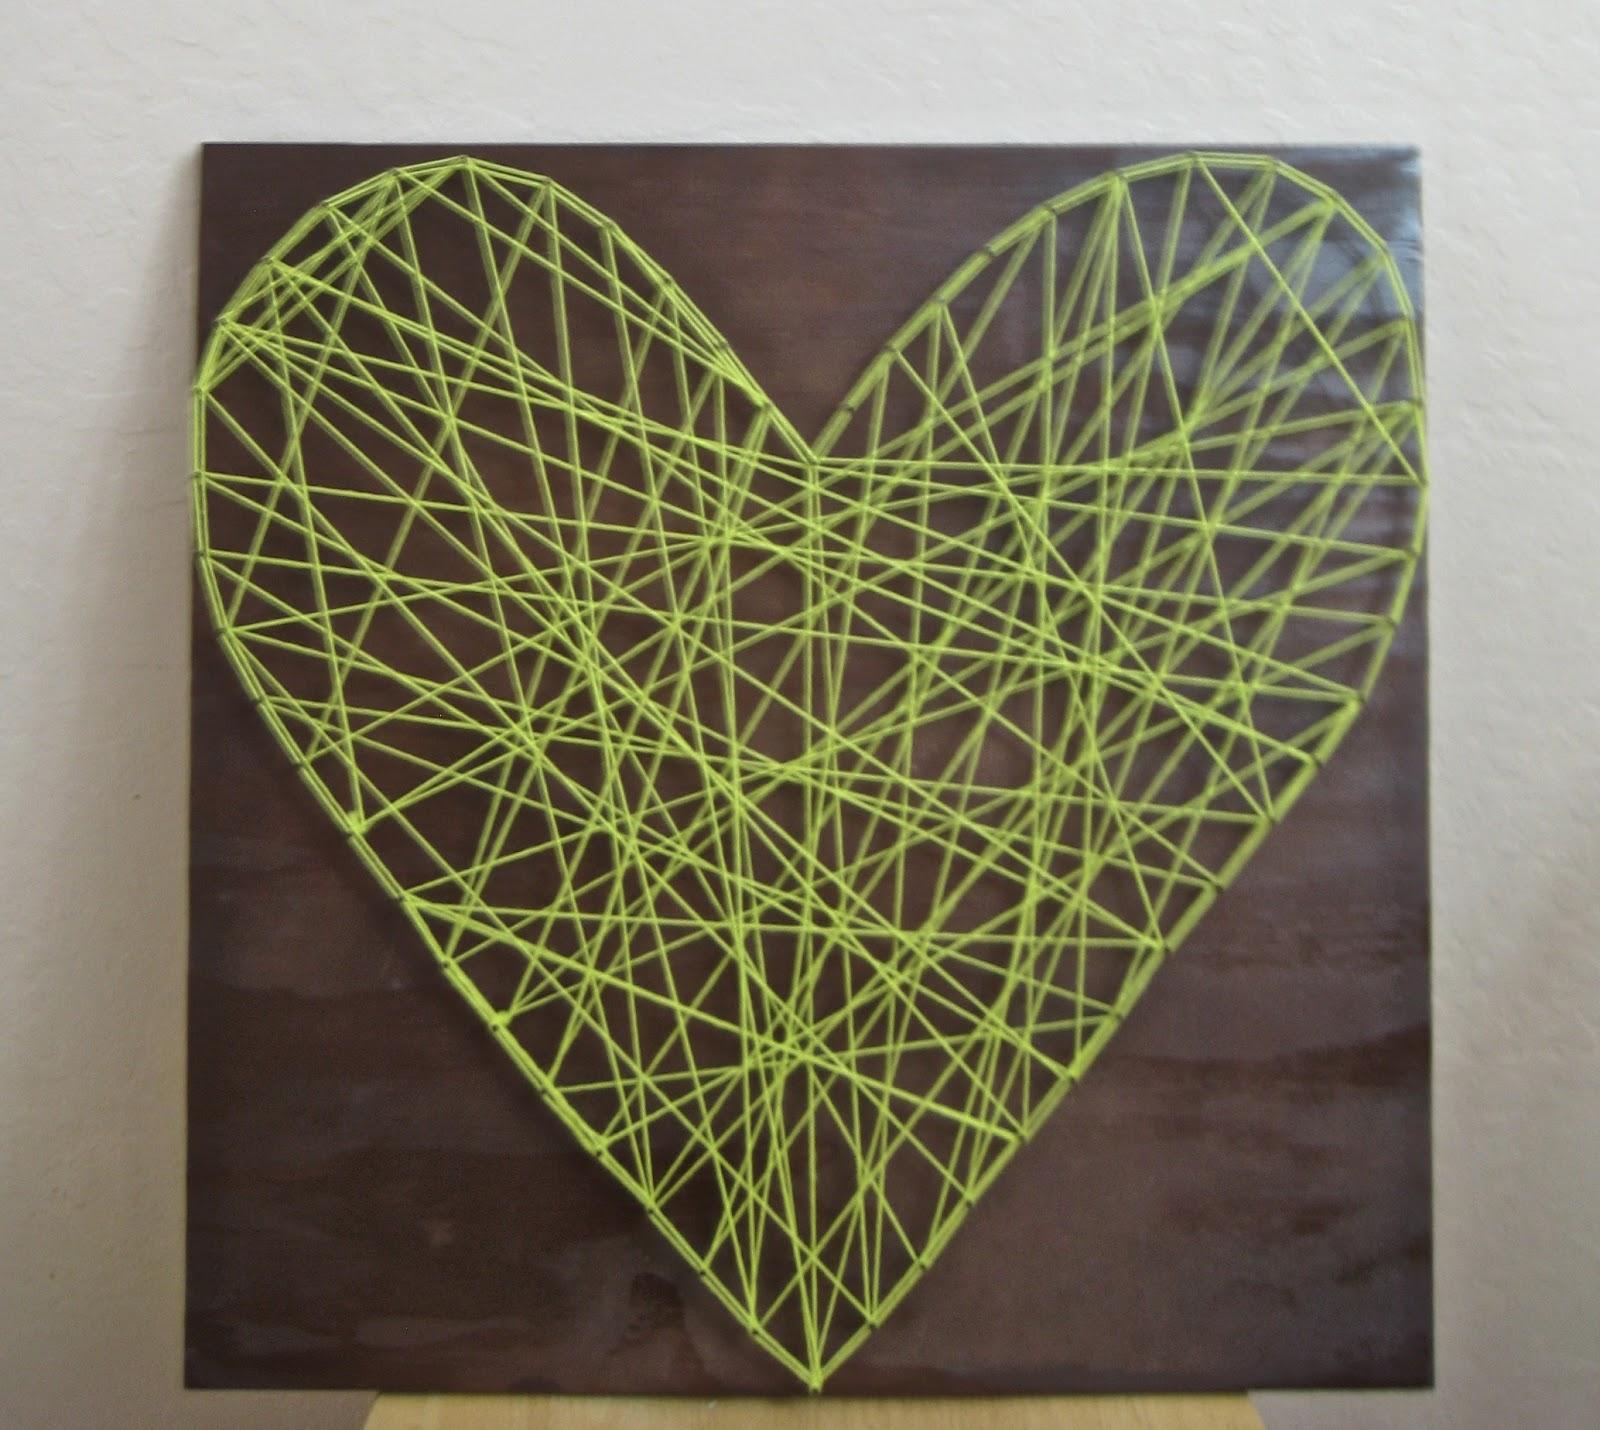 String Art: PrettyLOVE, PrettyLIFE: PrettyLITTLE String-art